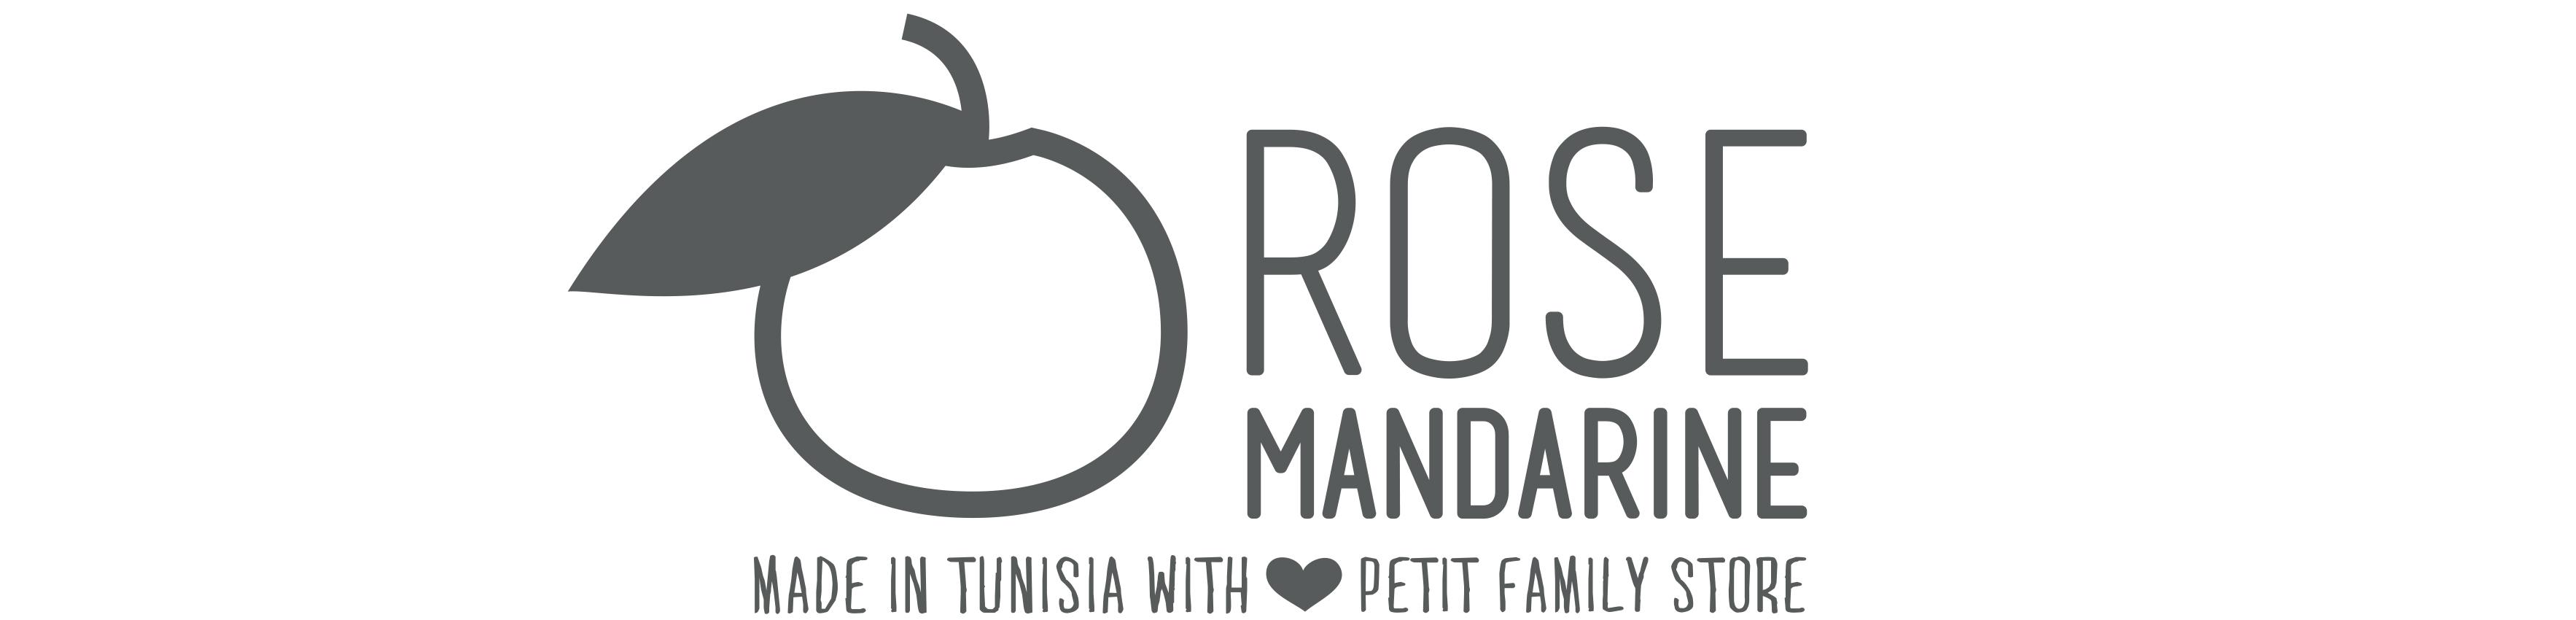 Rose Mandarine